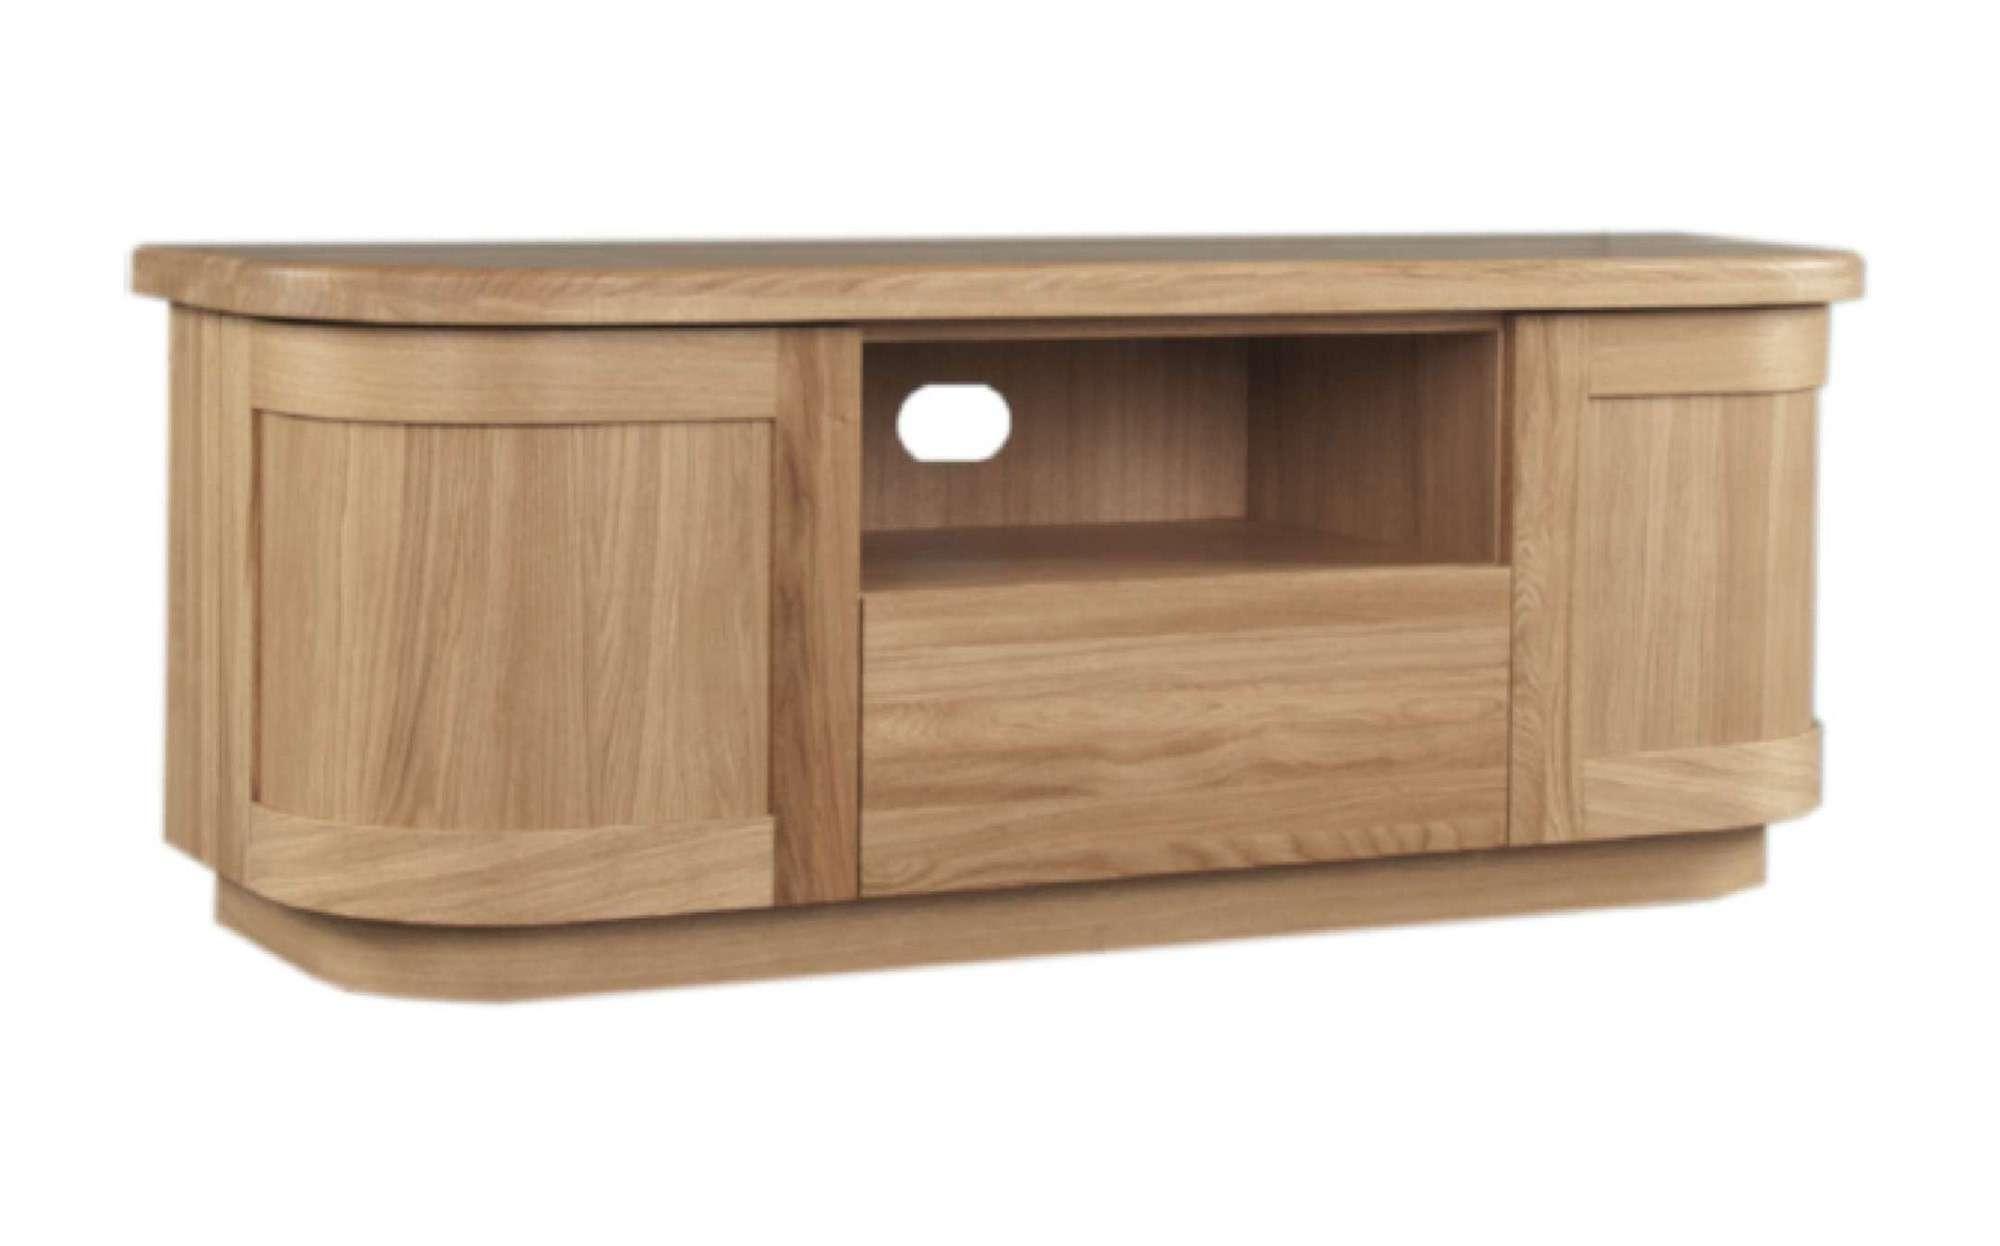 Sicily Solid Oak Tv Unit | Ice Interiors Inside Oak Tv Cabinets (View 10 of 20)